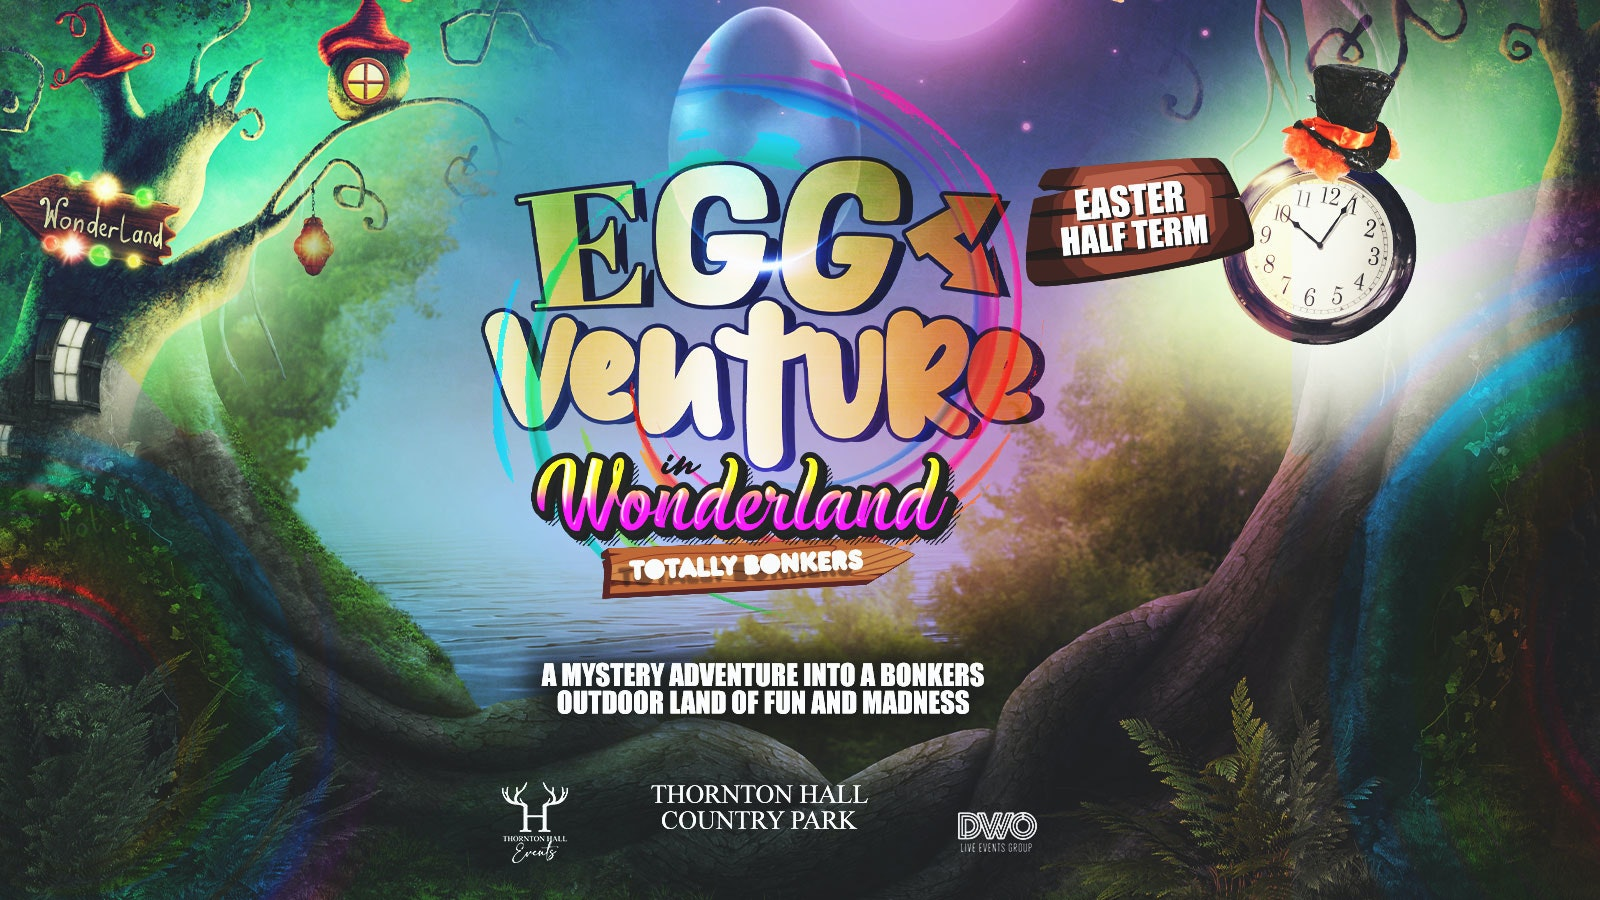 EggVenture in Wonderland – Friday 9th April – 11am